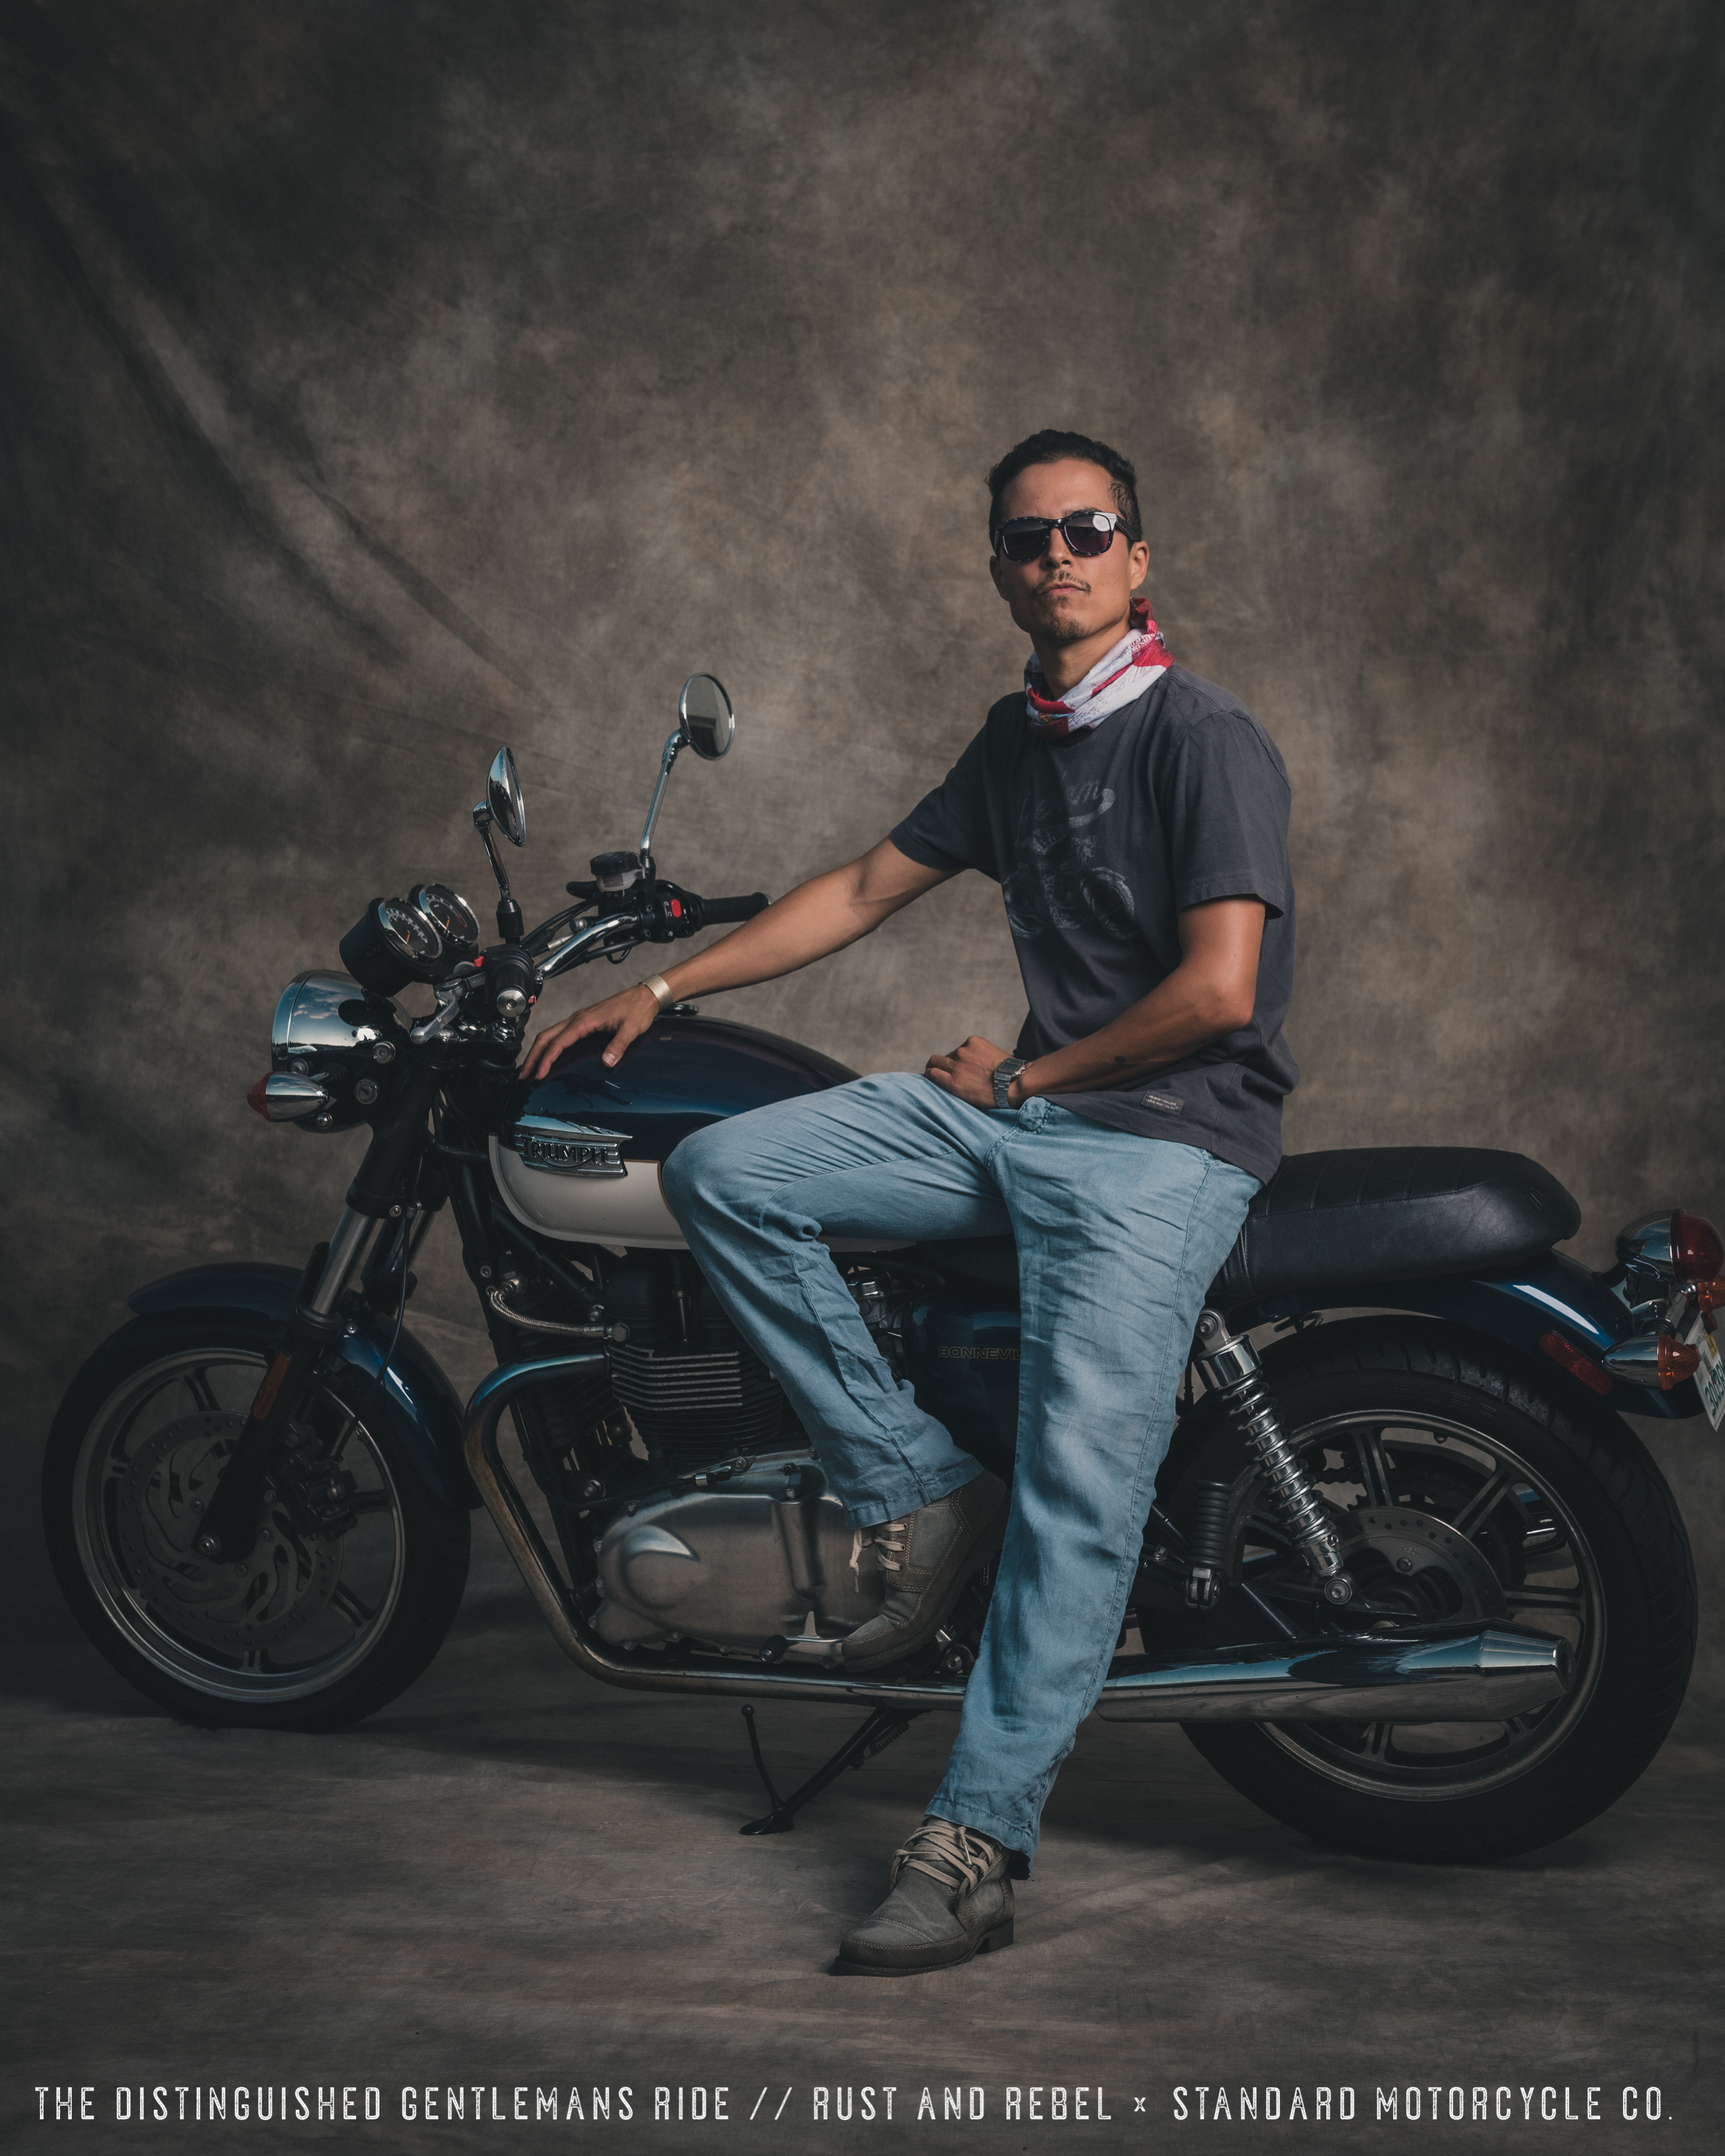 The Distinguished Gentleman's Ride 2019 [PEOPLE - PHOTO BY @MIKEDUNNUSA] - 0126.jpg